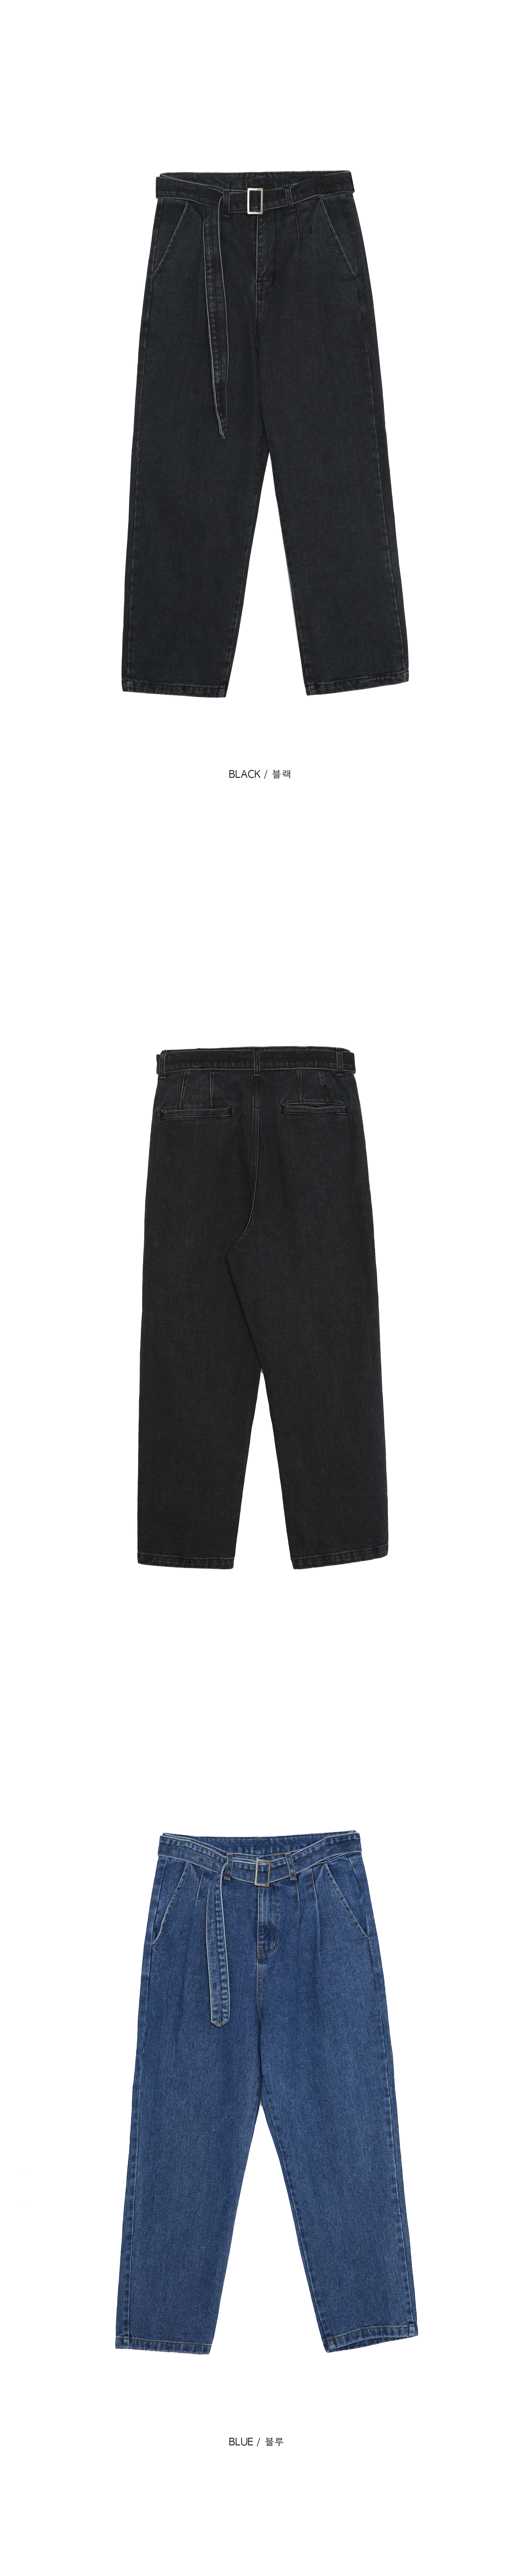 belt set pin-tuck jeans - men